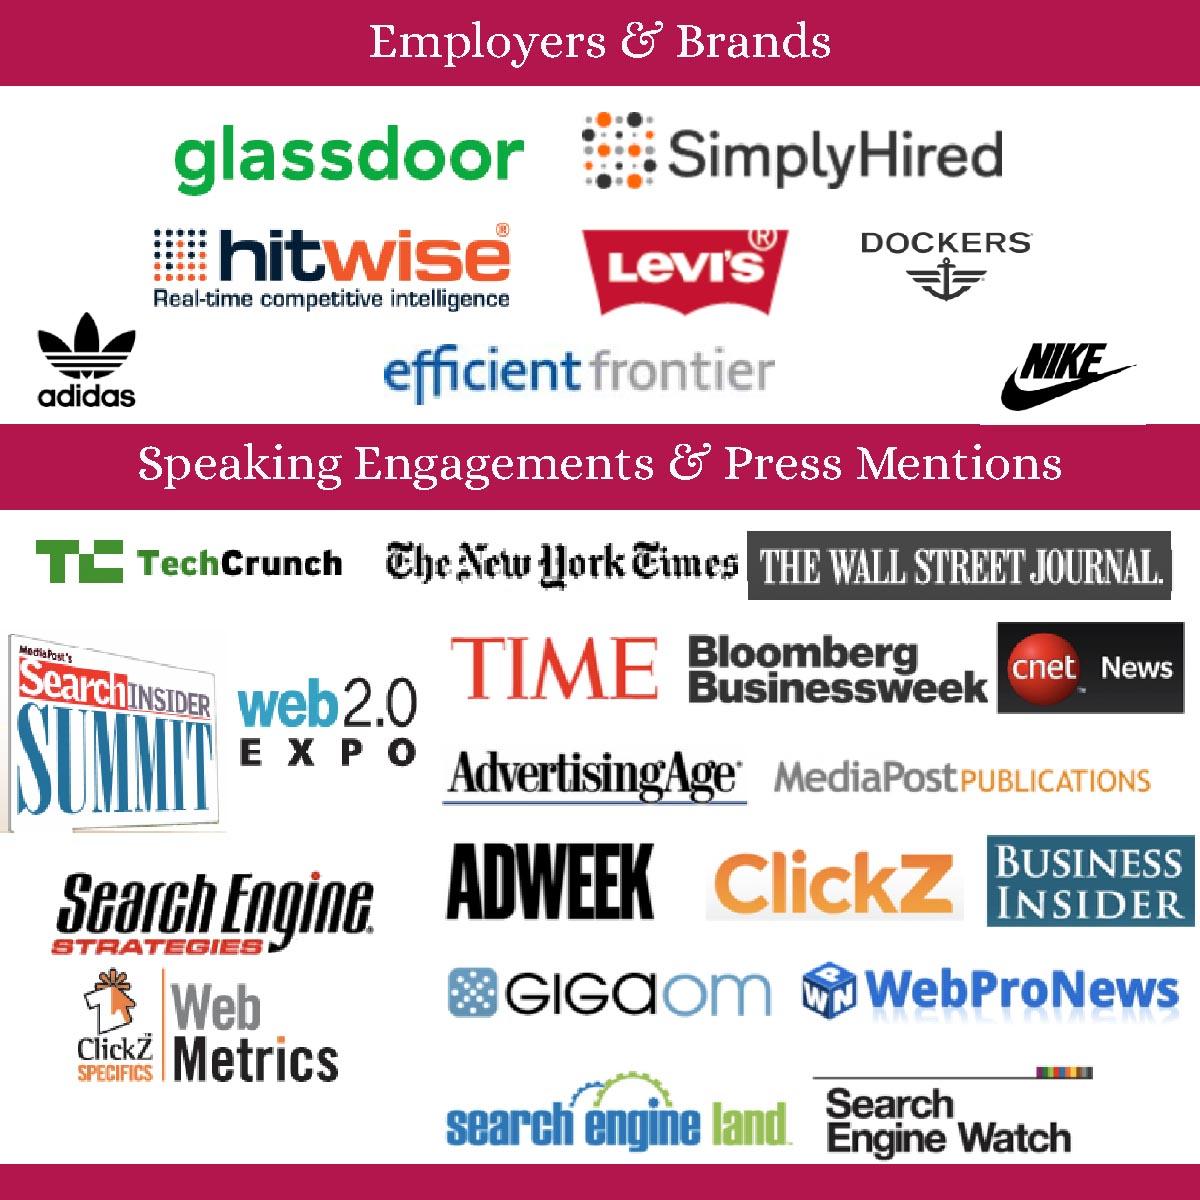 Companies I've worked for, conferences I've spoken at, press outlets I've been mentioned in.